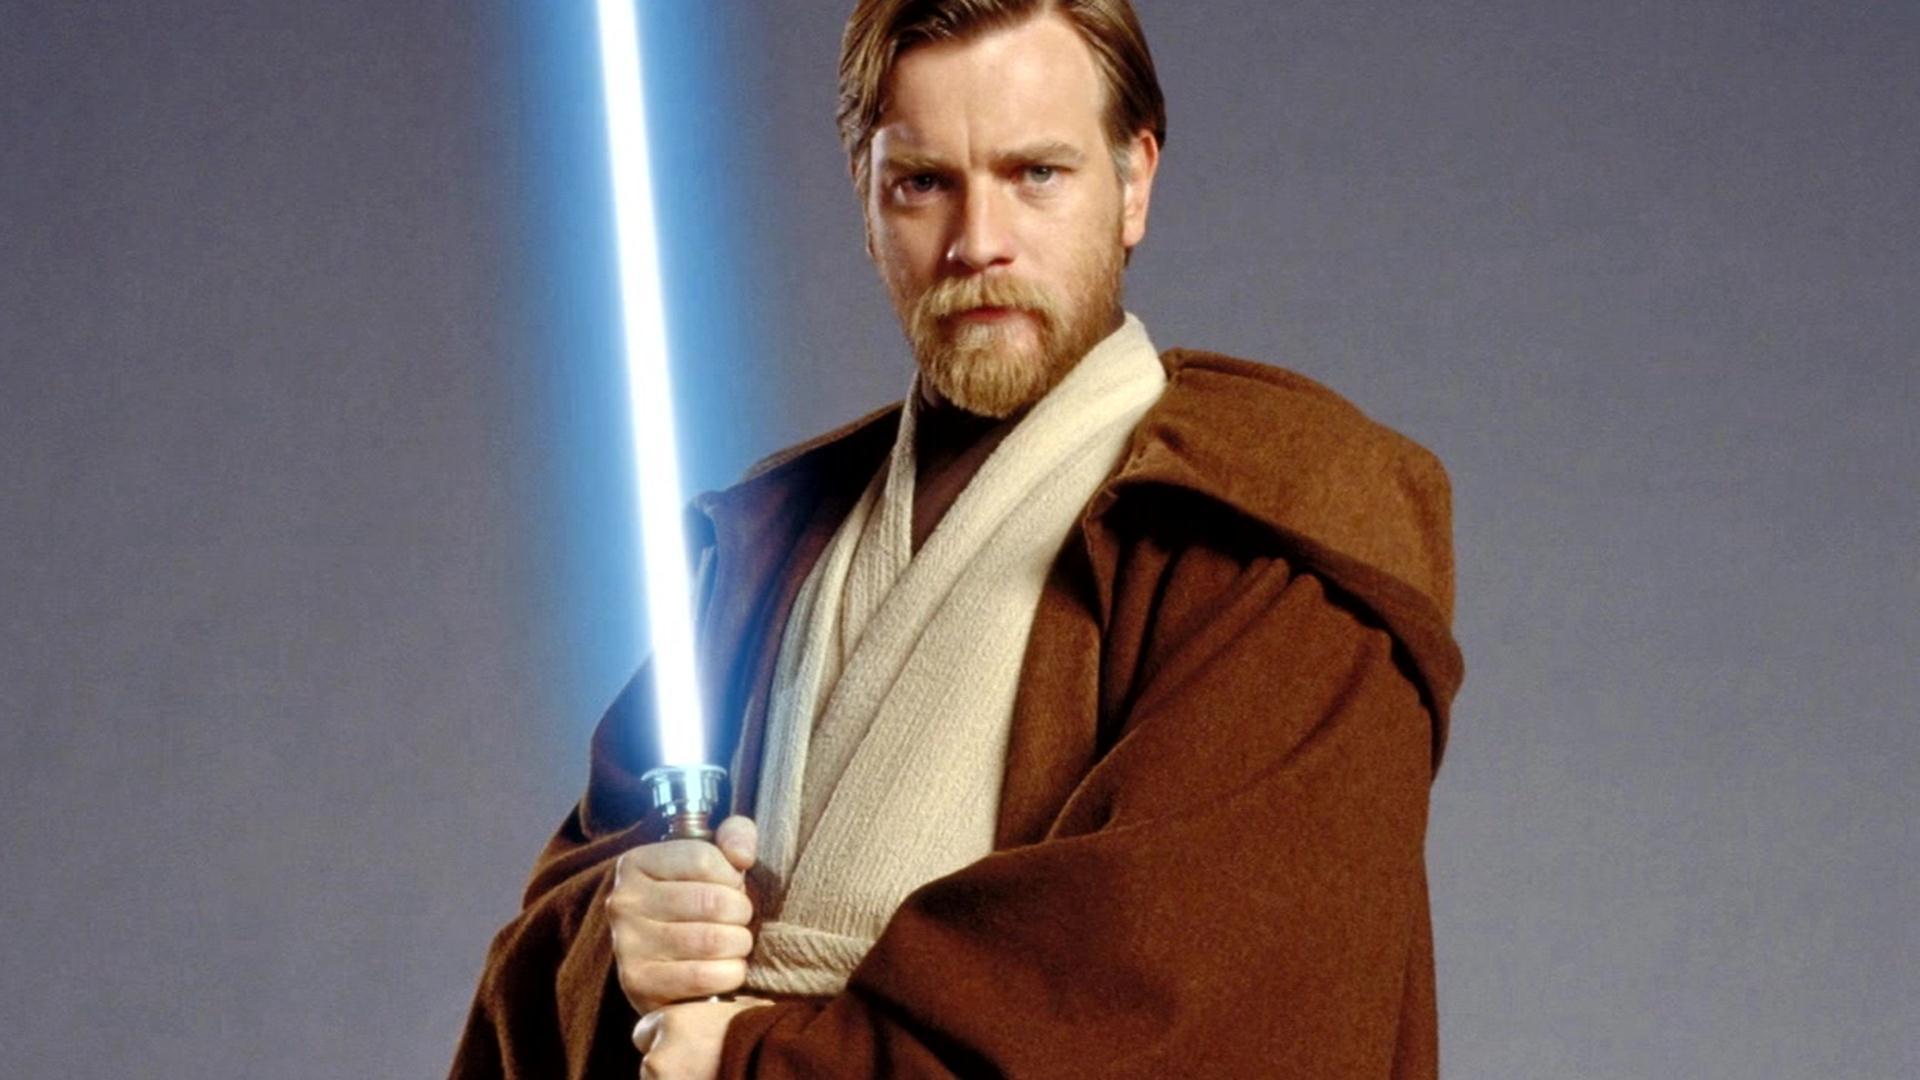 Ewan McGregor volverá como Obi-Wan Kenobi para una serie en Disney Plus